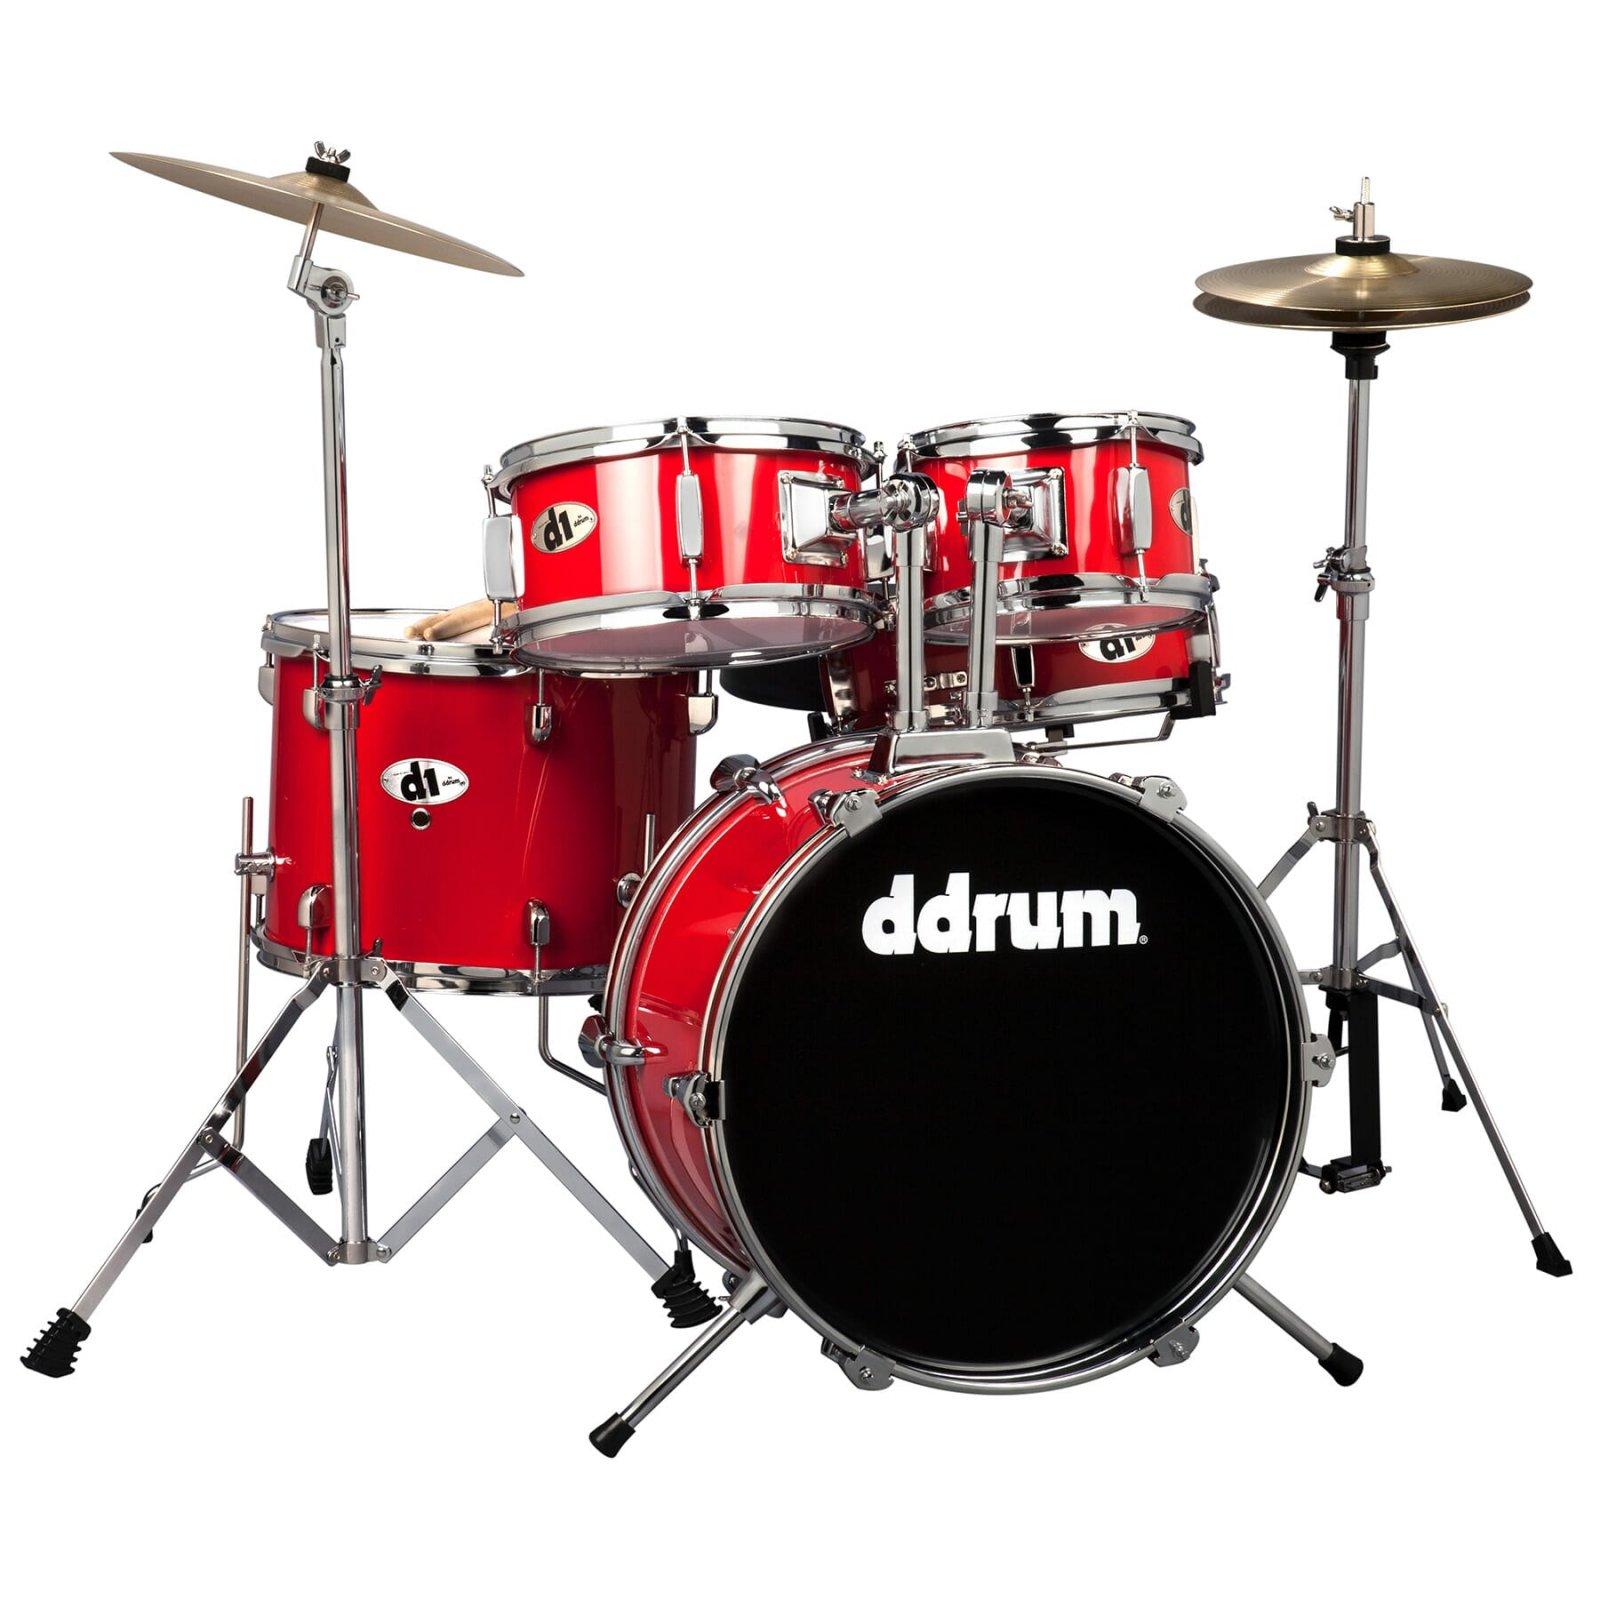 ddrum D1 Junior- Complete Drum Set with Cymbals